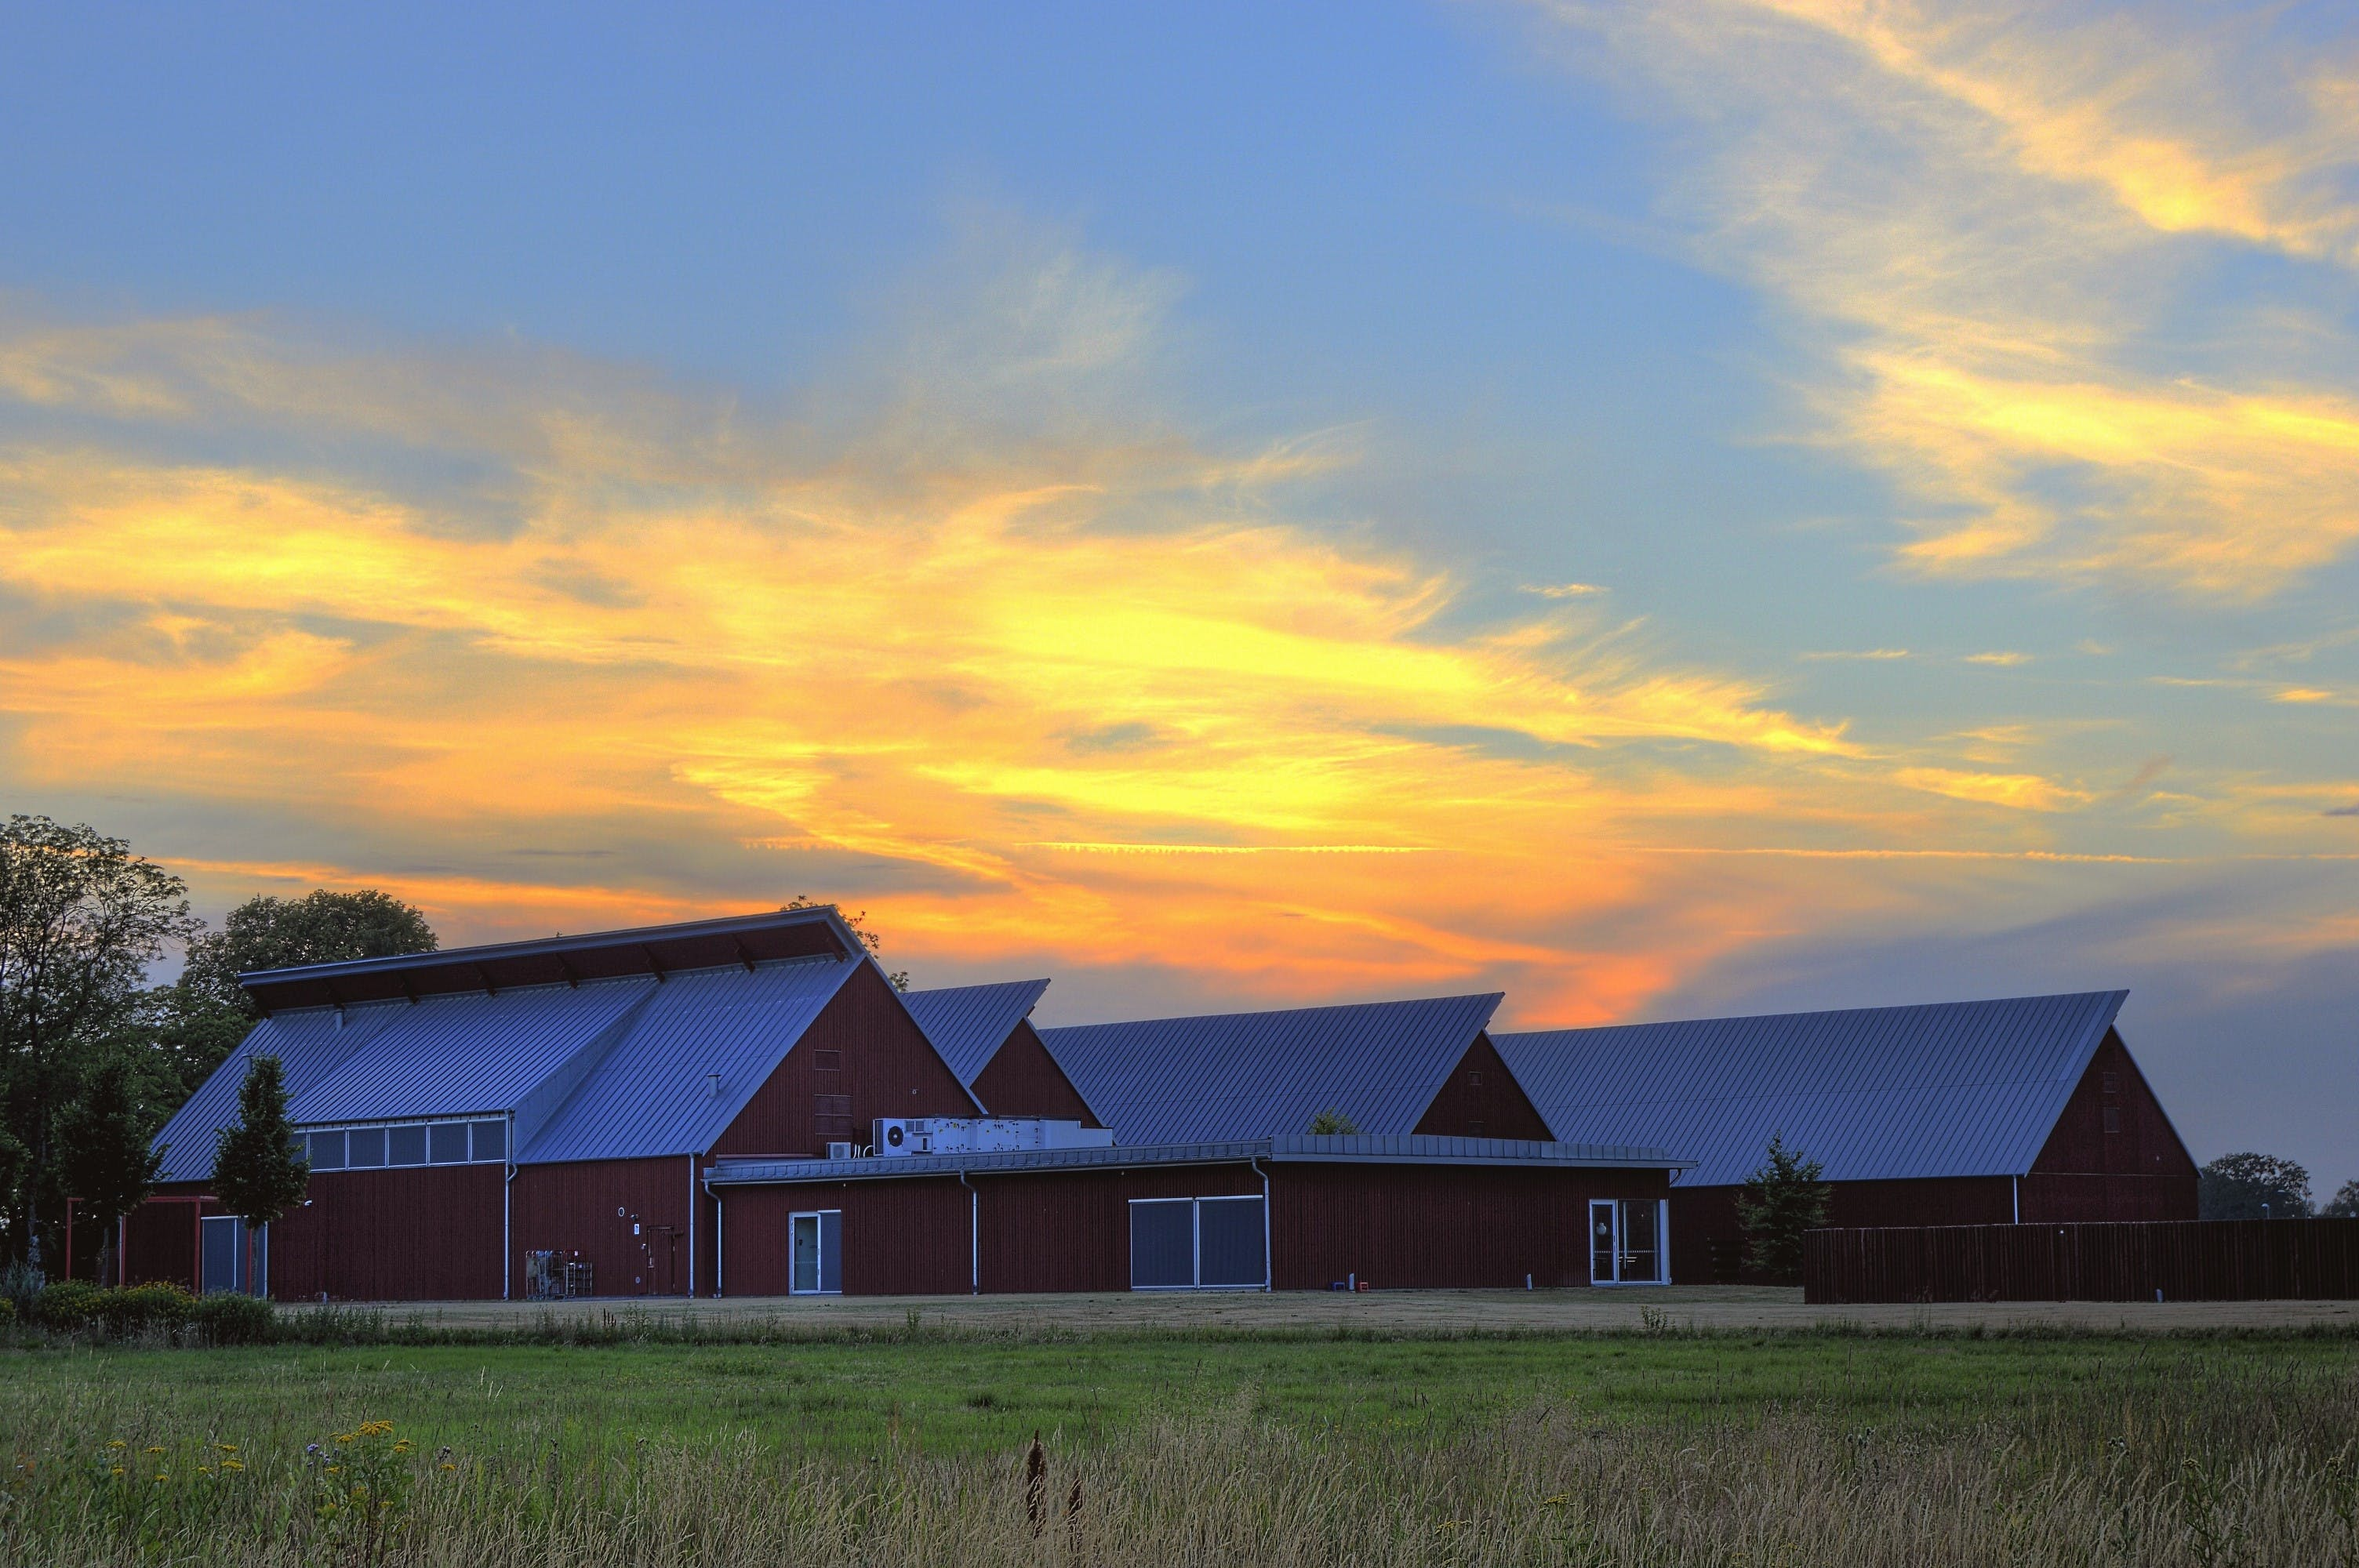 Photo Of Barn Near Grass Field During Golden Hour